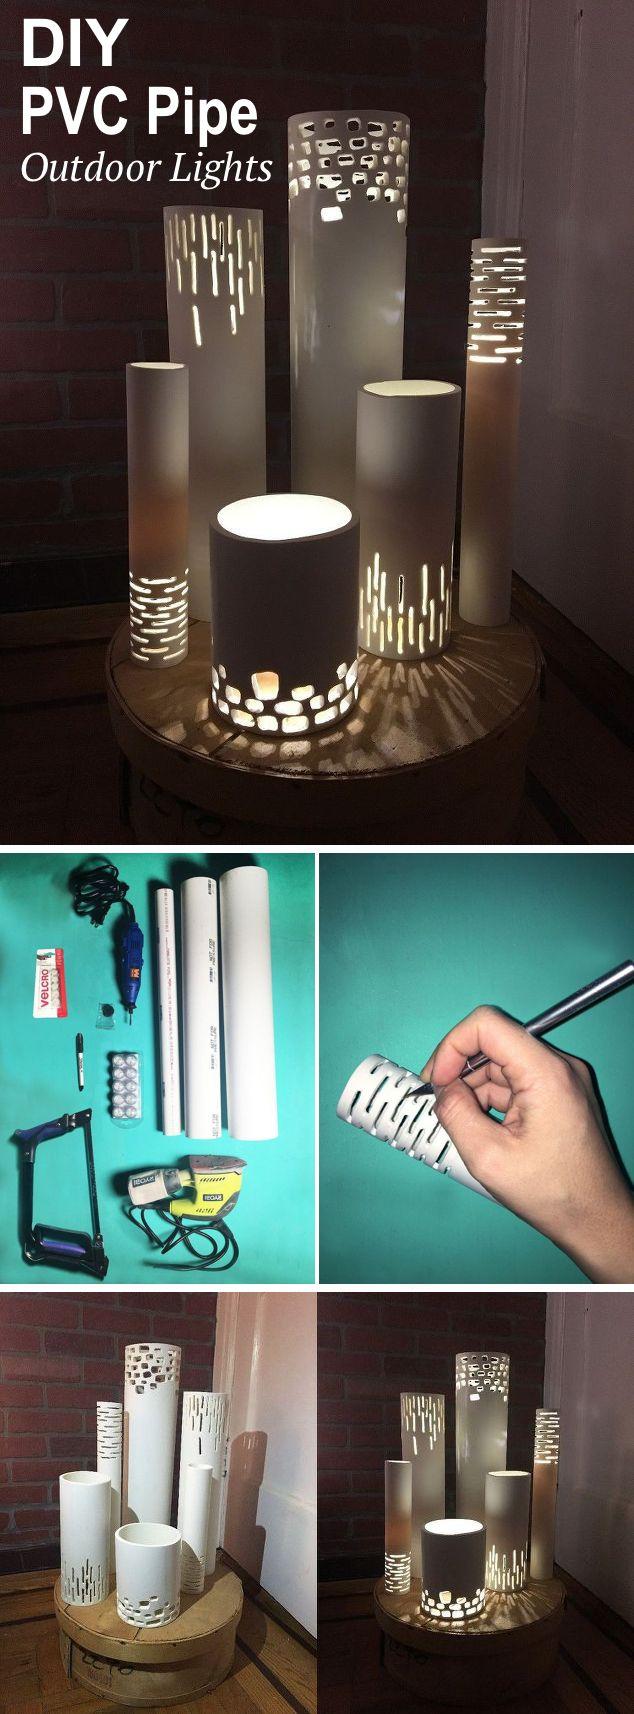 DIY PVC Pipe Lights